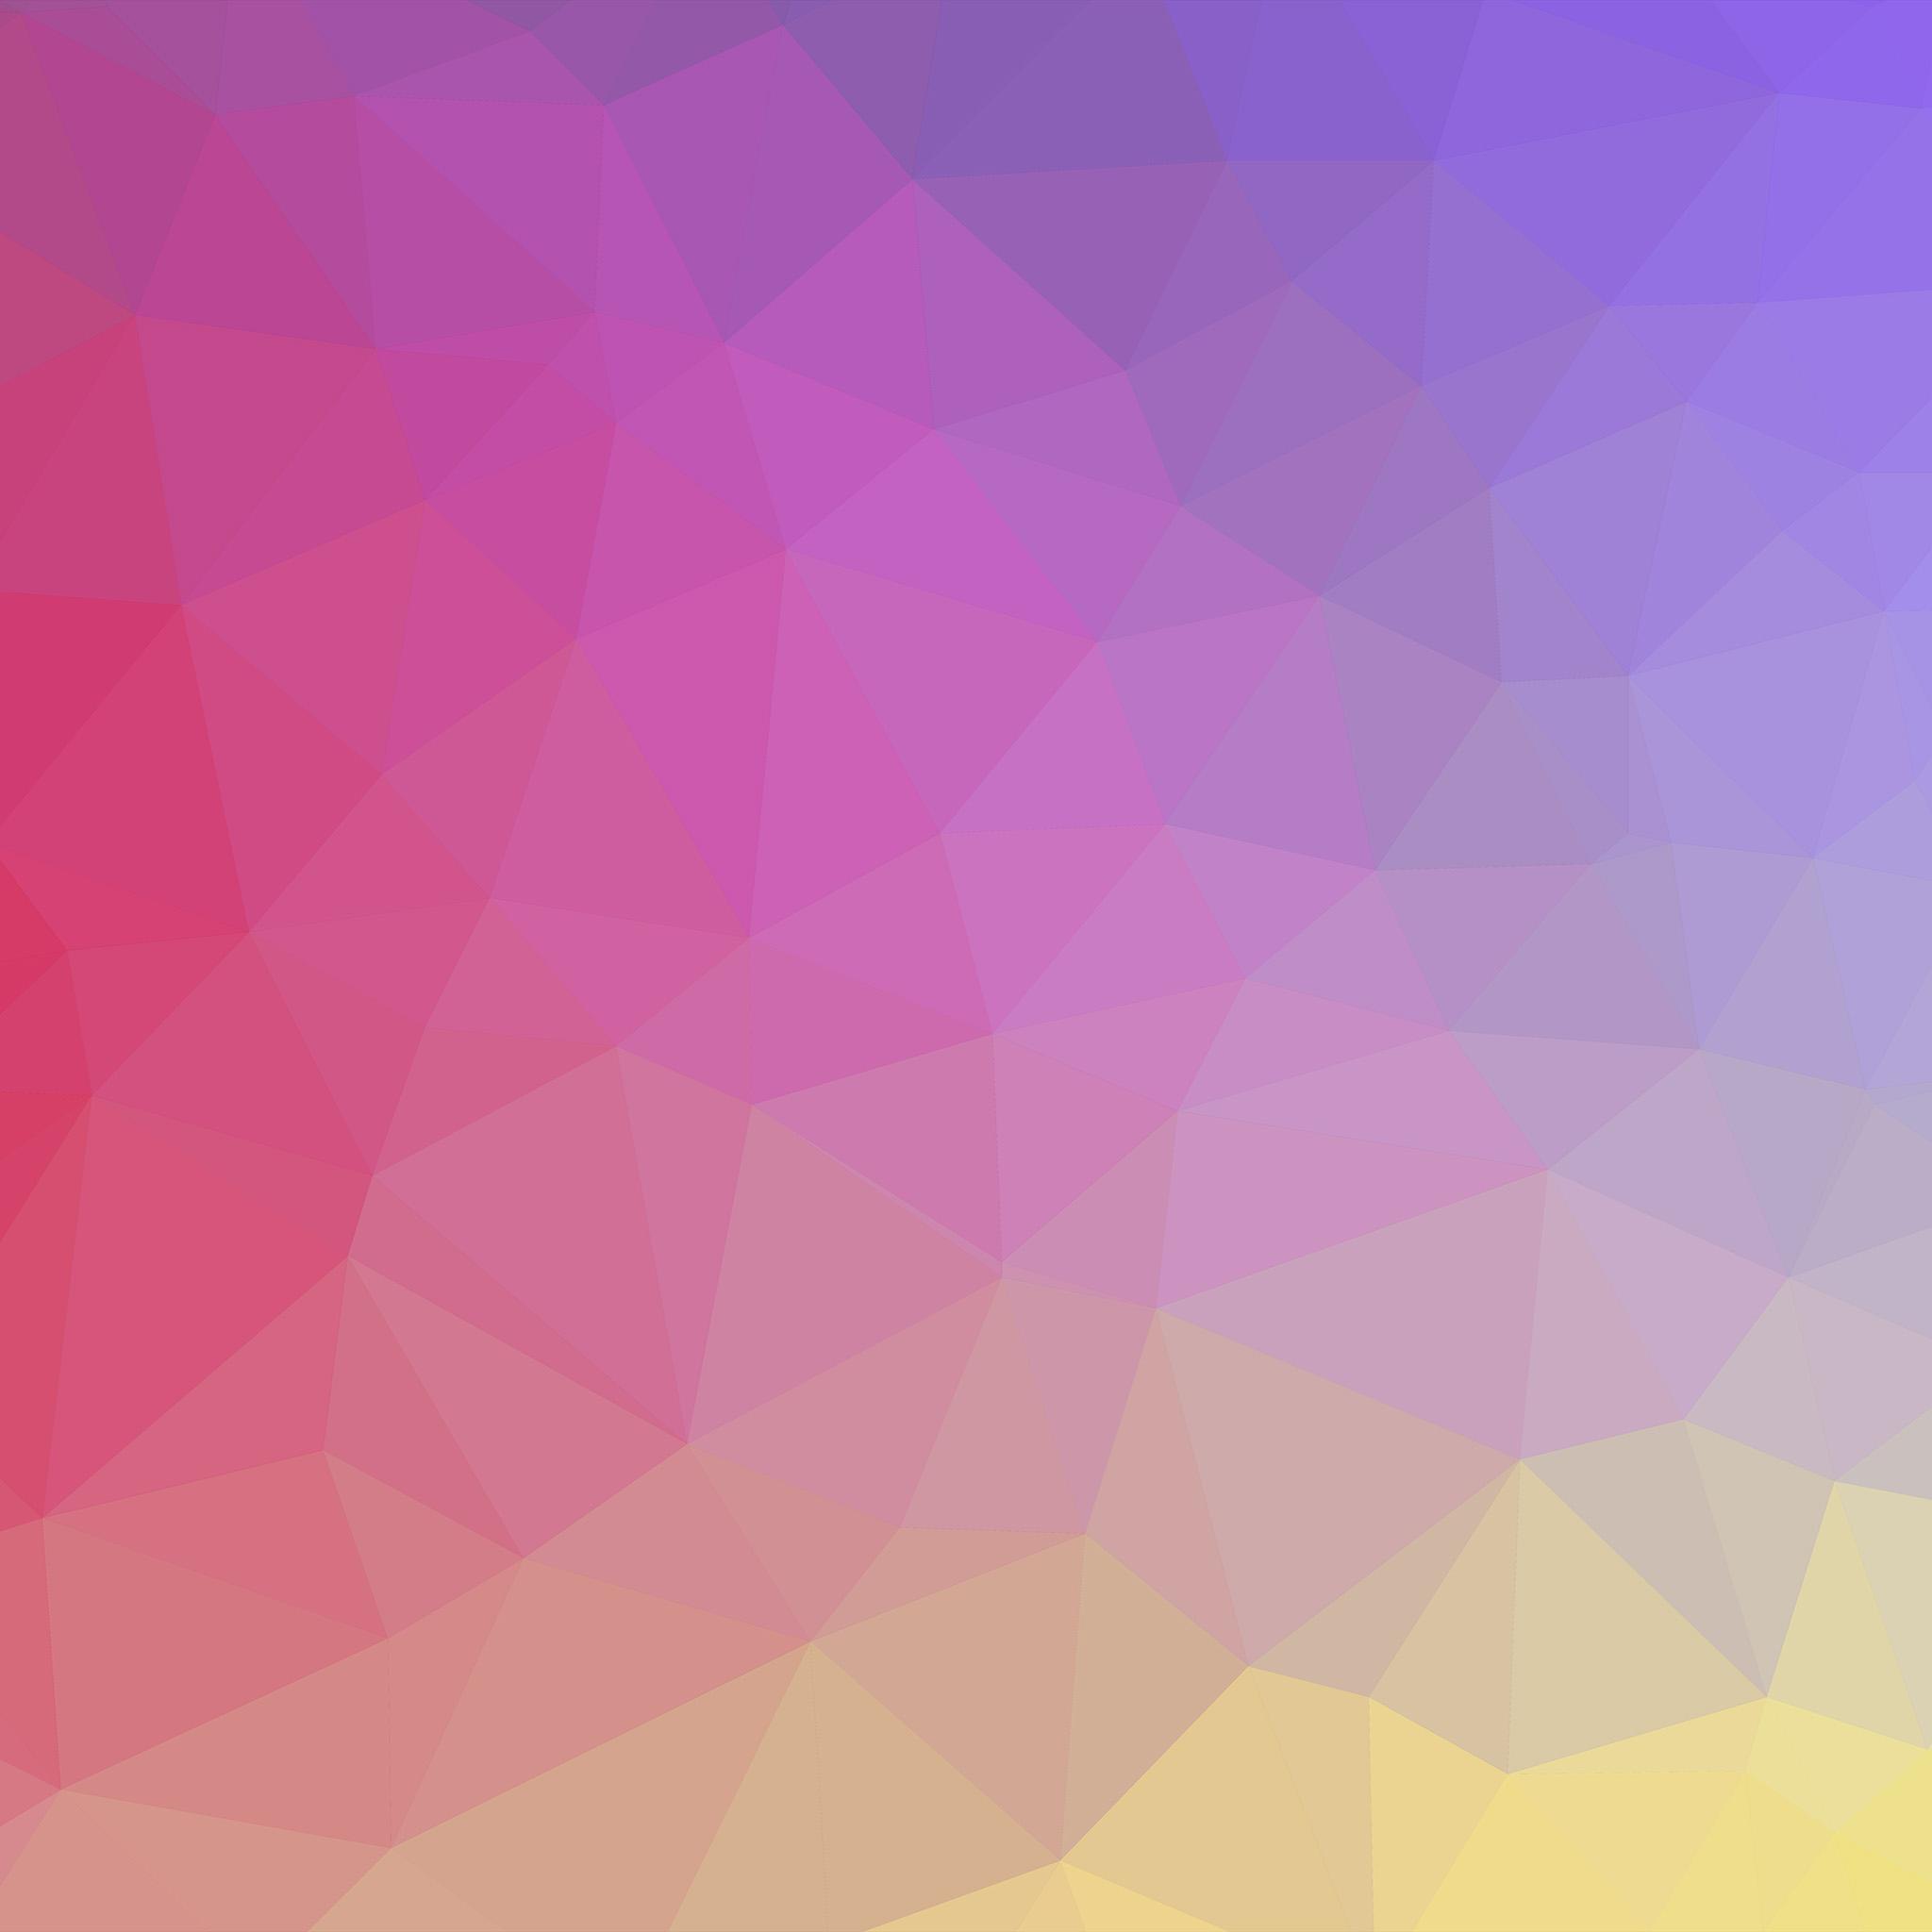 Vk65 Samsung Galaxy Polyart Pastel Pink Yellow Pattern